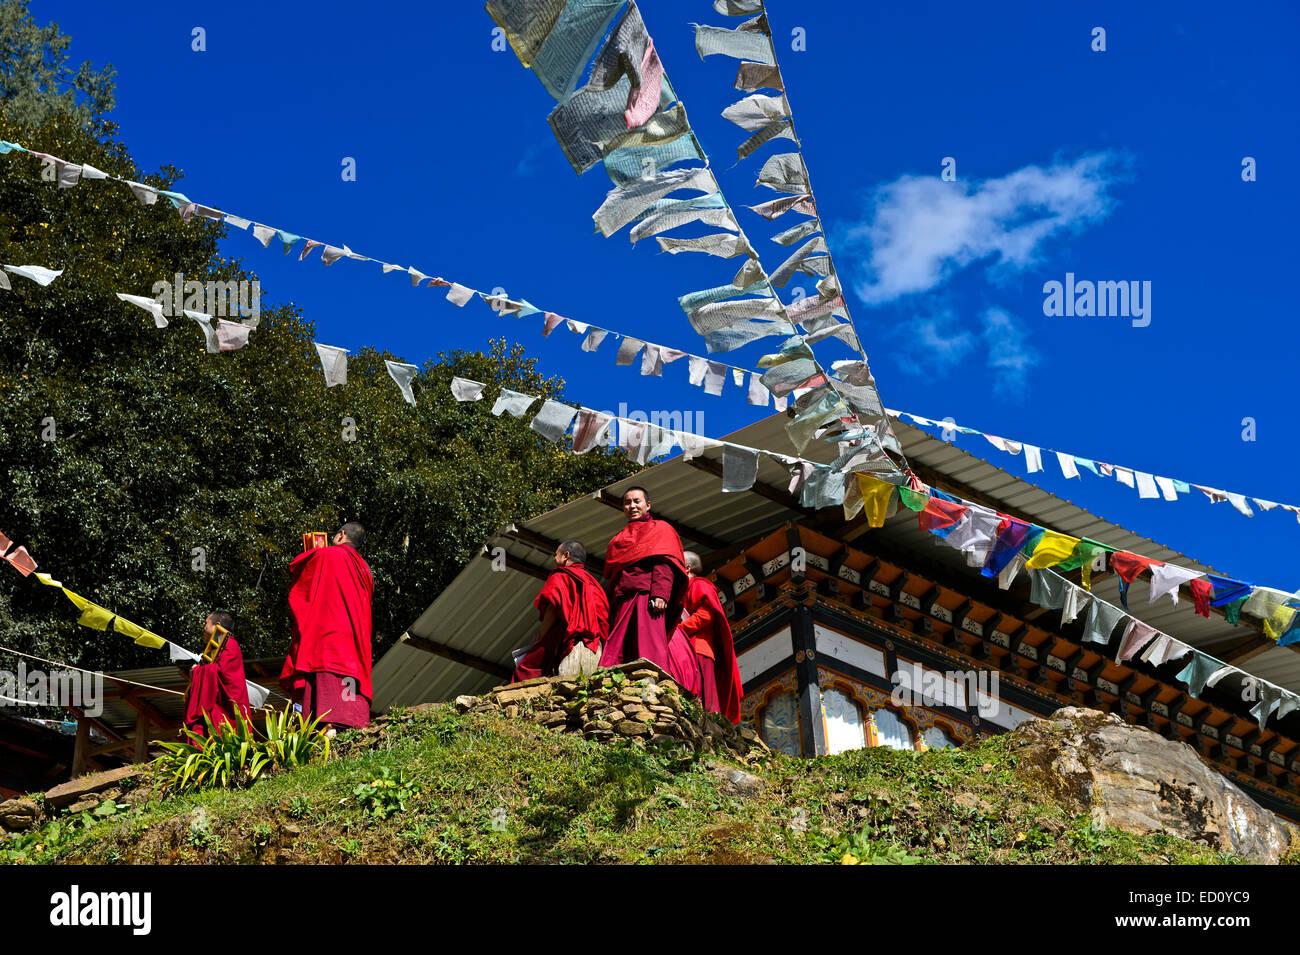 Students of the Tango Buddhist Institute, Tango Monastery, Bhutan - Stock Image